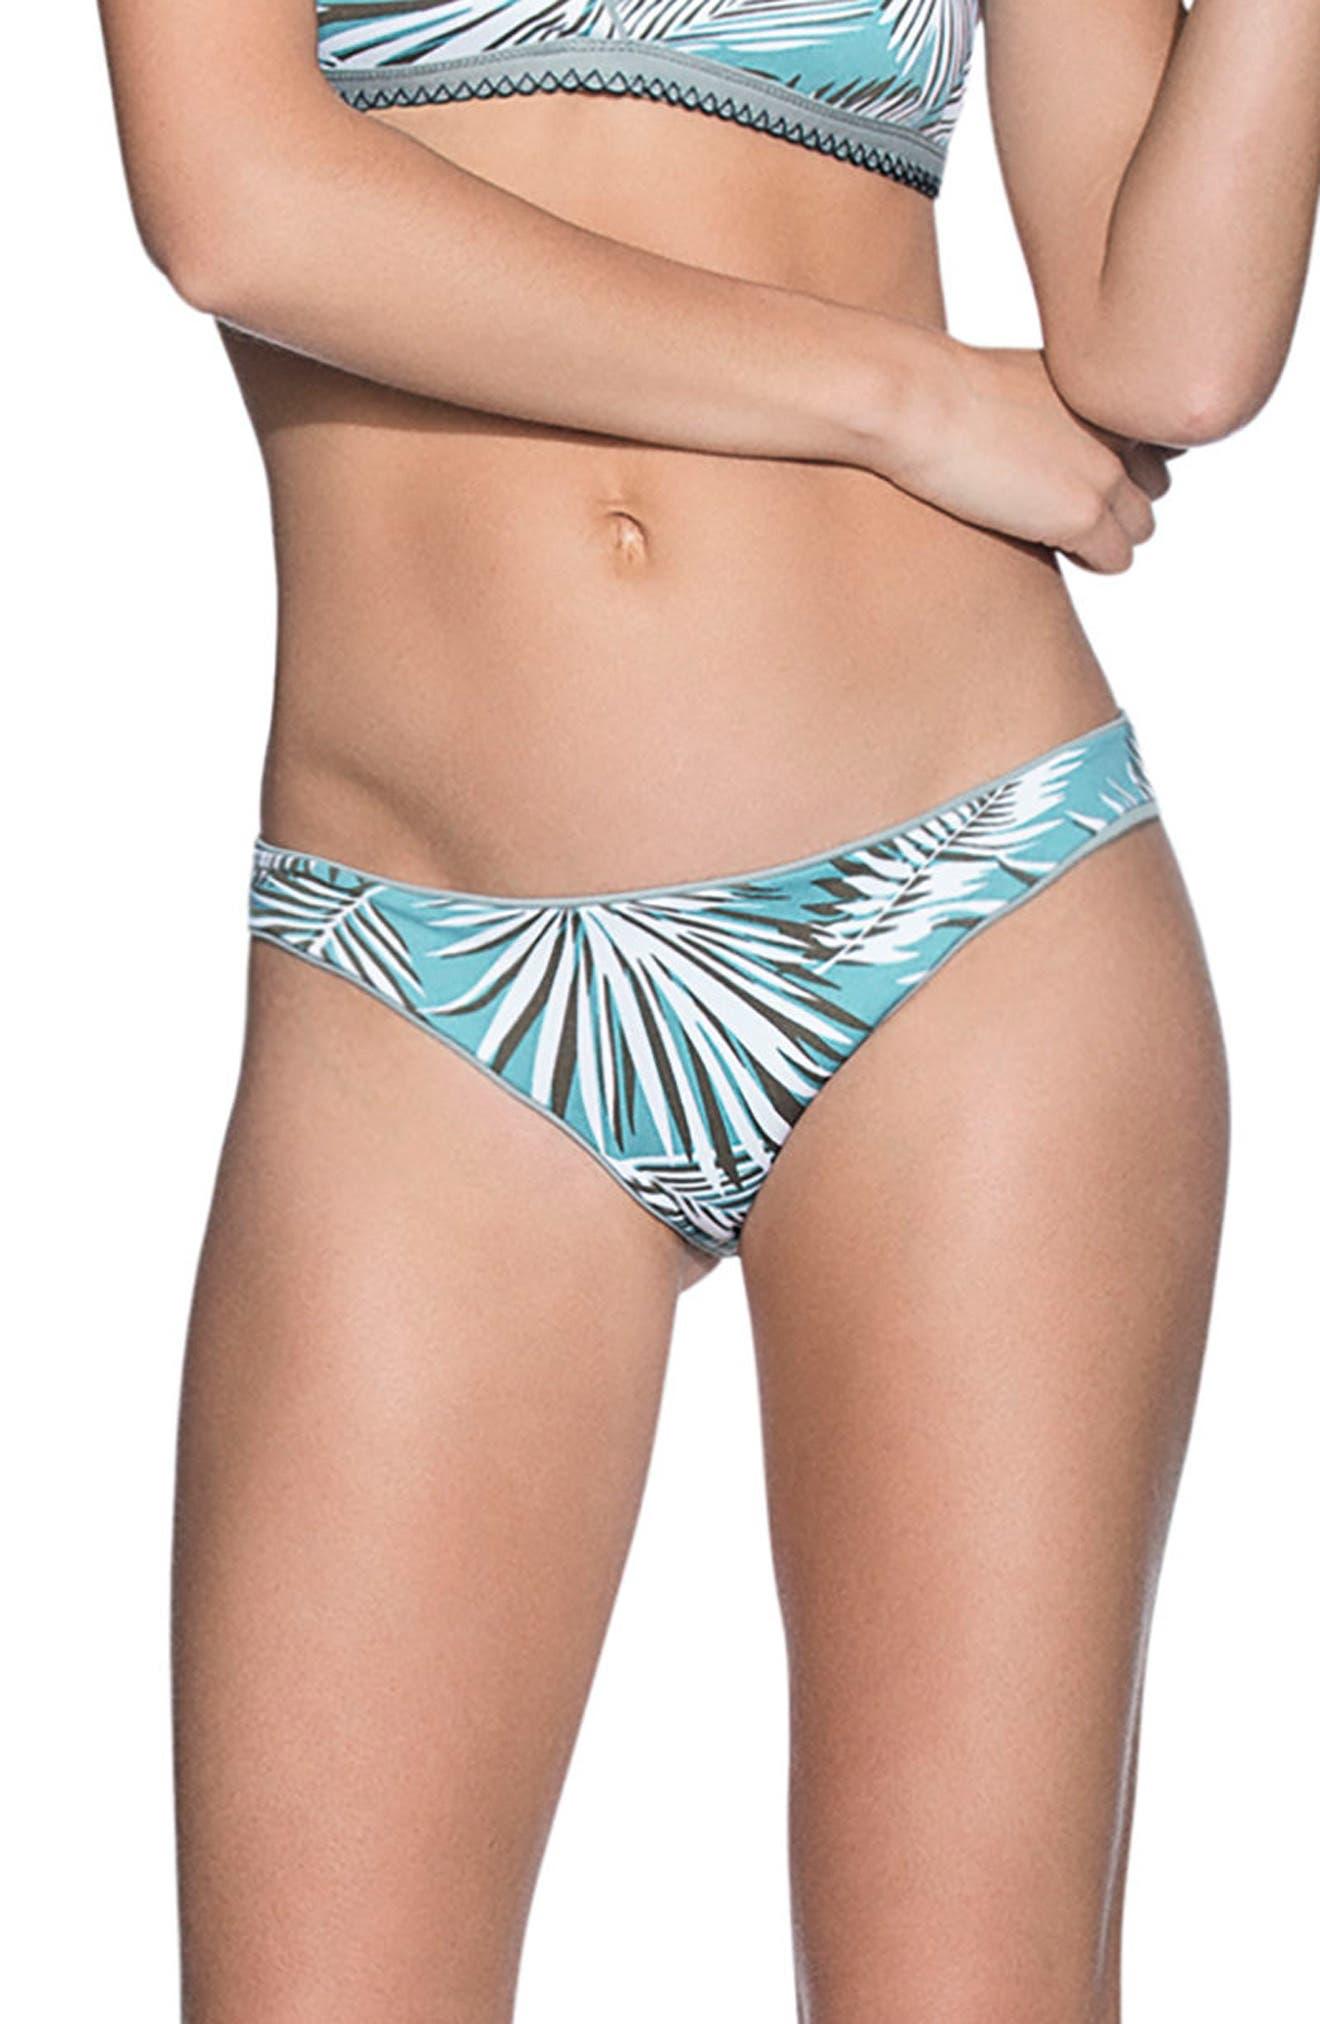 Lily Pad Flirt Signature Cut Reversible Bikini Bottoms,                             Alternate thumbnail 2, color,                             Open Green